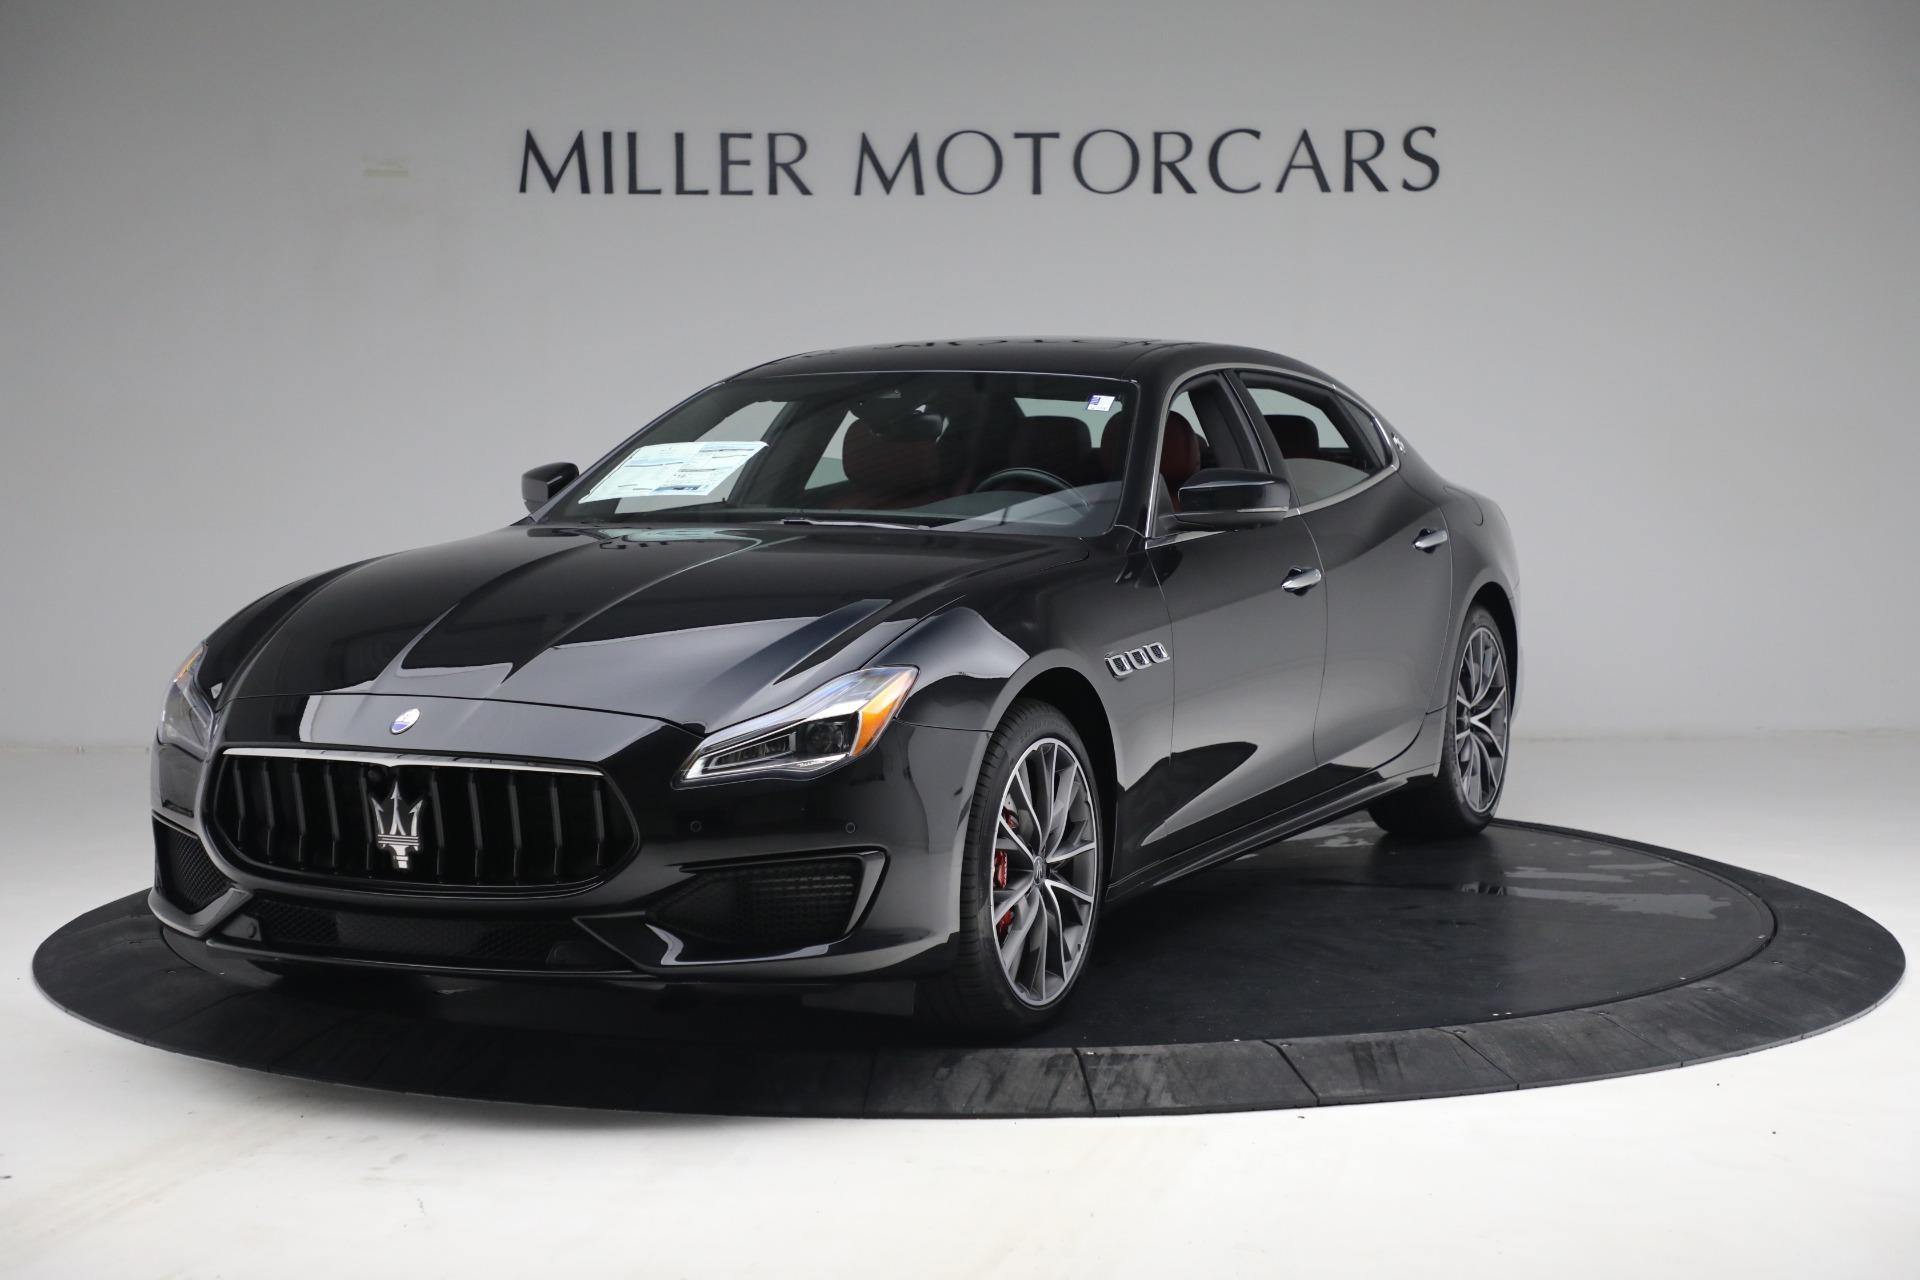 New-2021-Maserati-Quattroporte-S-Q4